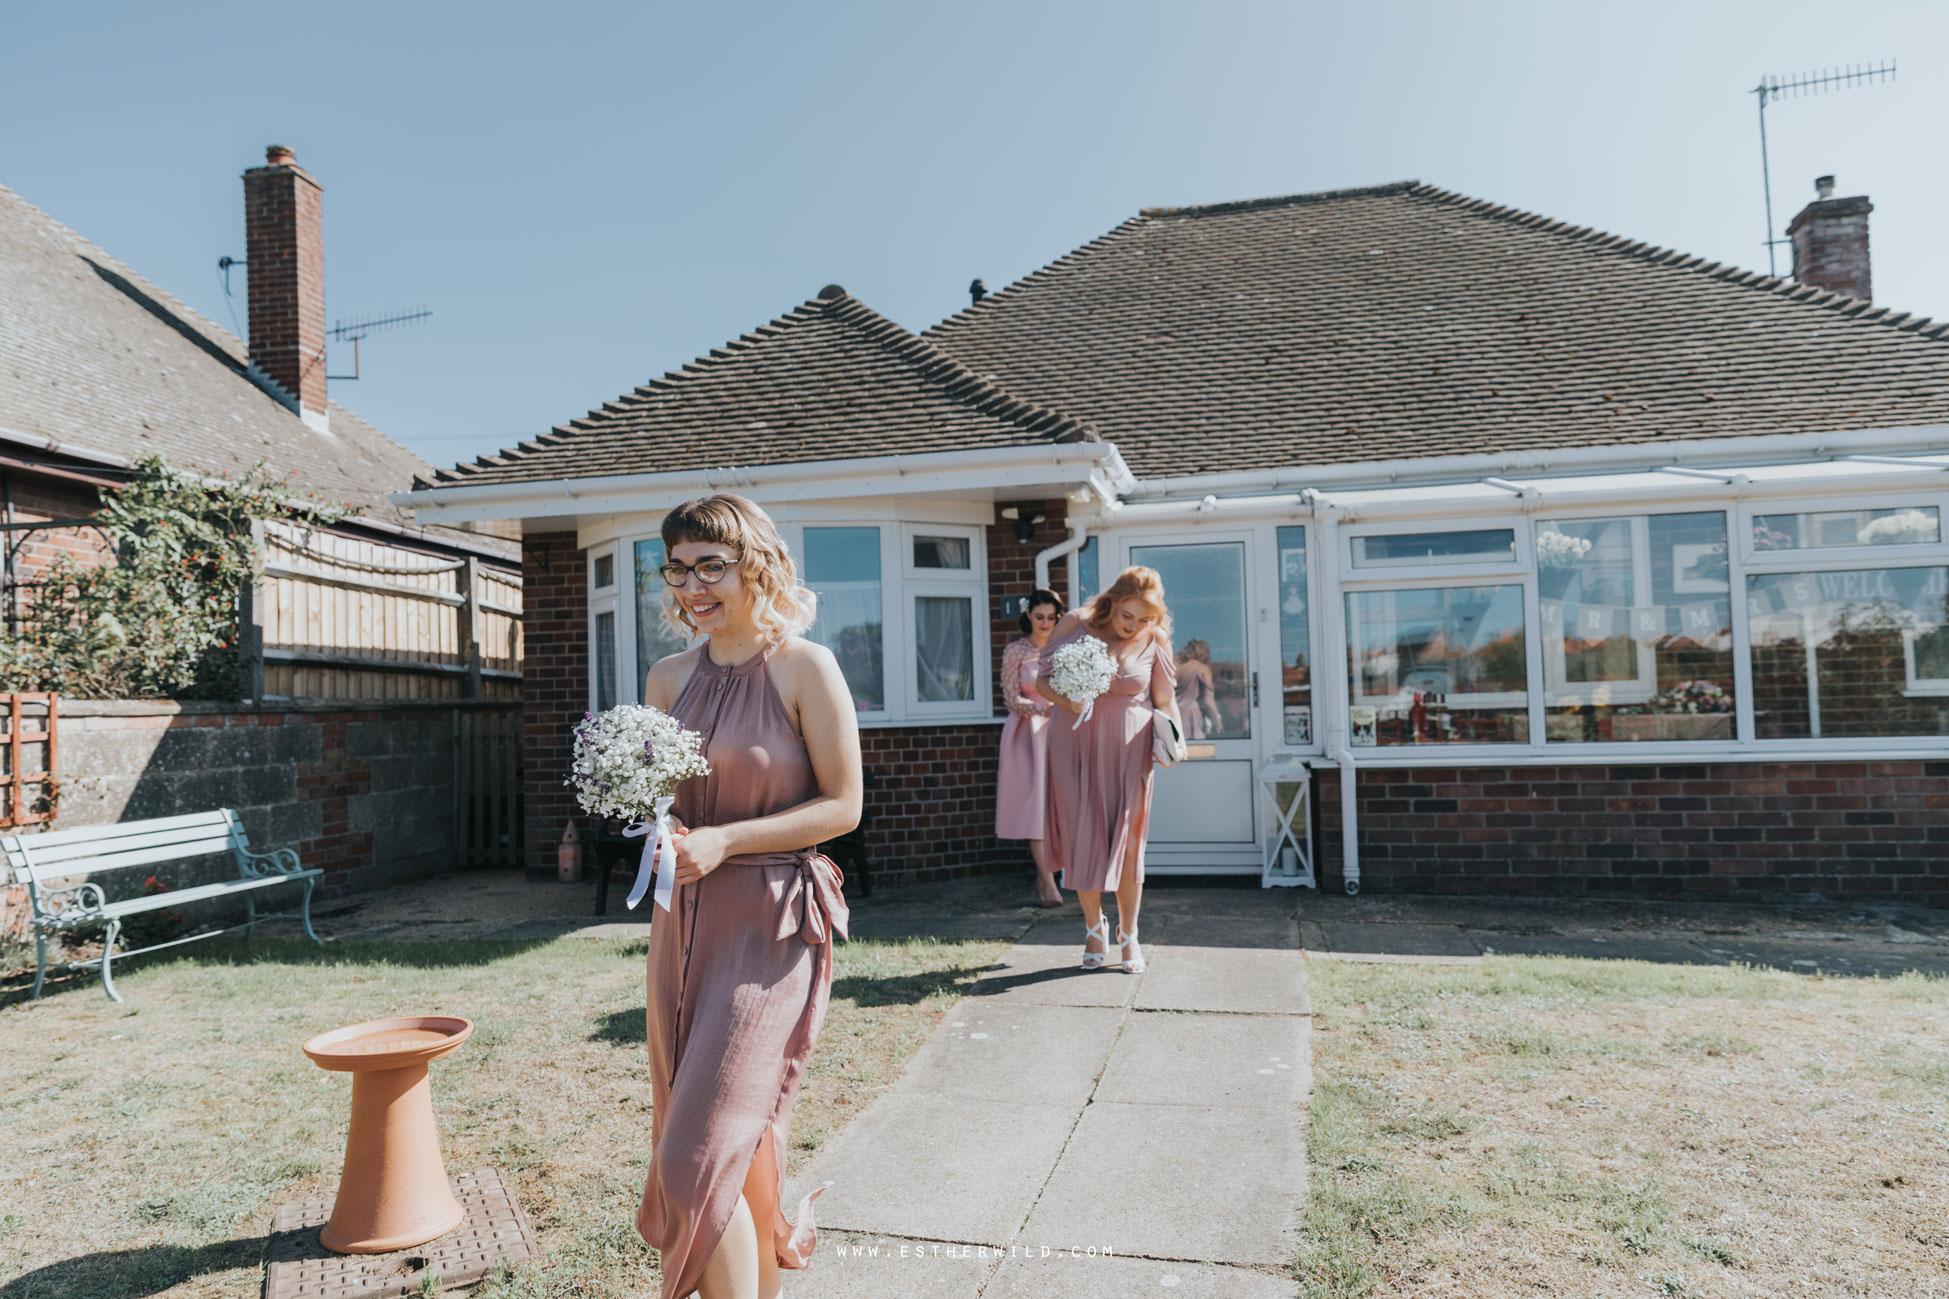 Cromer_Wedding_Beach_Outdoor_Ceremony_Norfolk_North_Lodge_Registry_Office_Rocket_House_Cafe_Cromer_Pier_IMG_3457.jpg